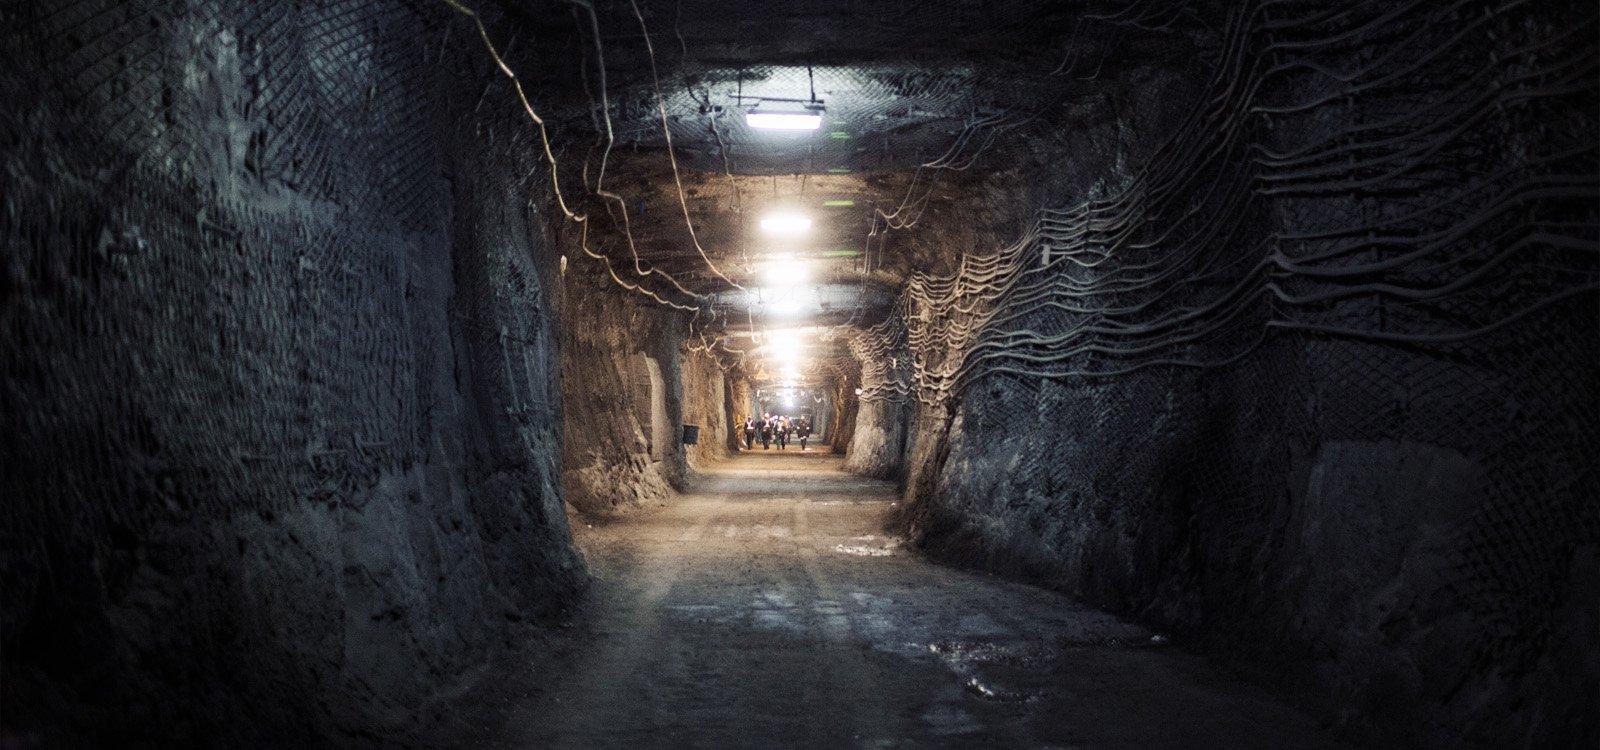 Every day, around 6,000 people head underground to work in the Rudna mine.